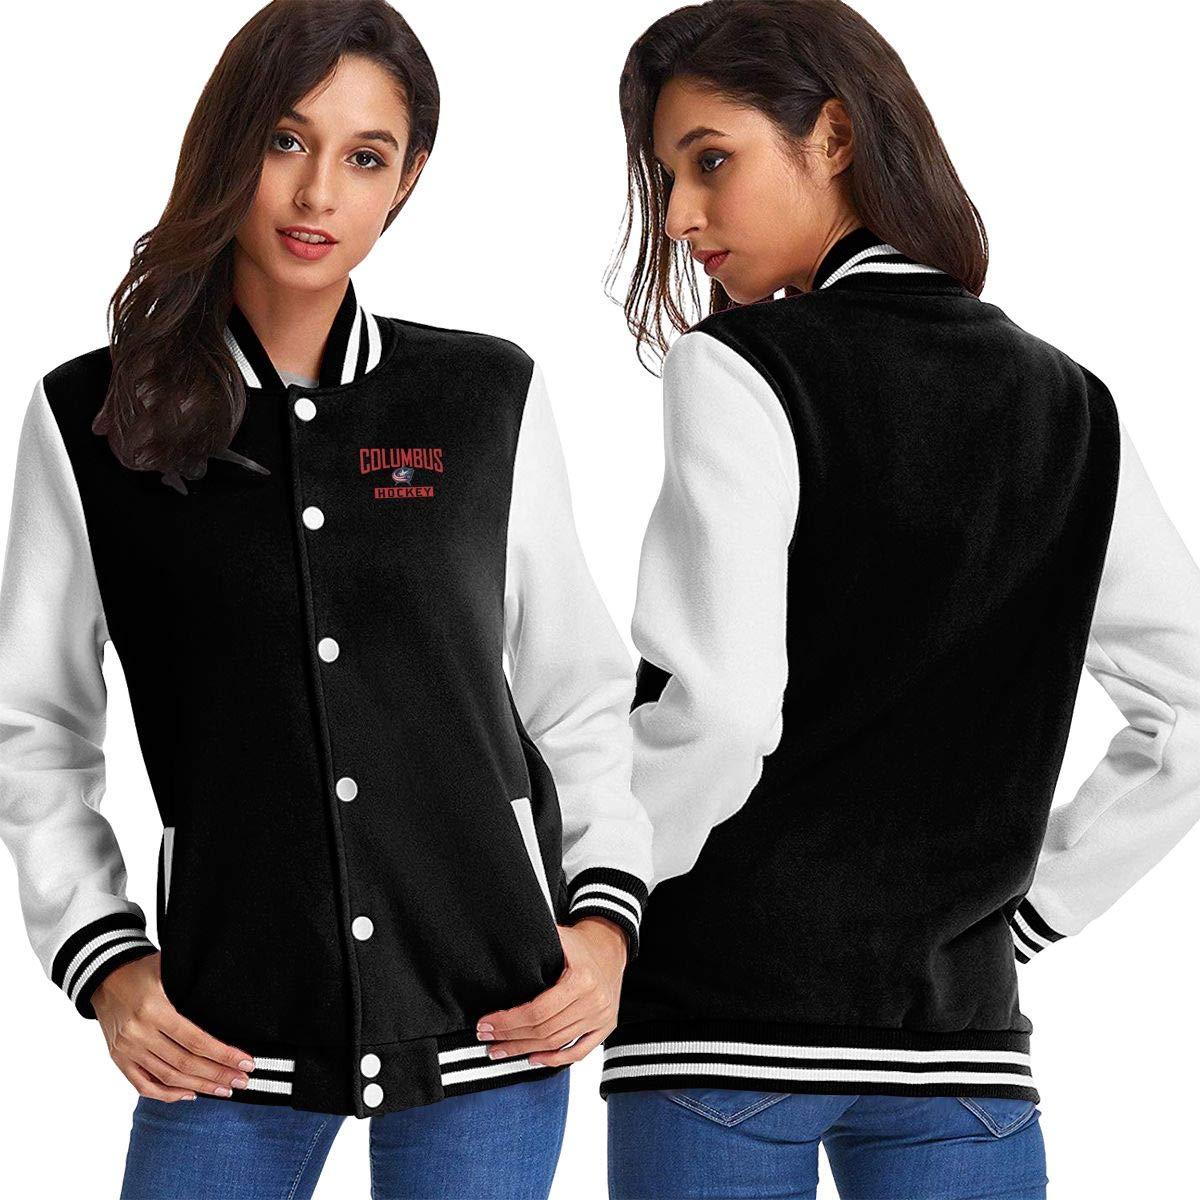 Black Women Basketballsadw 2015ColumbusblueeJacketsPride Baseball Uniform Jacket